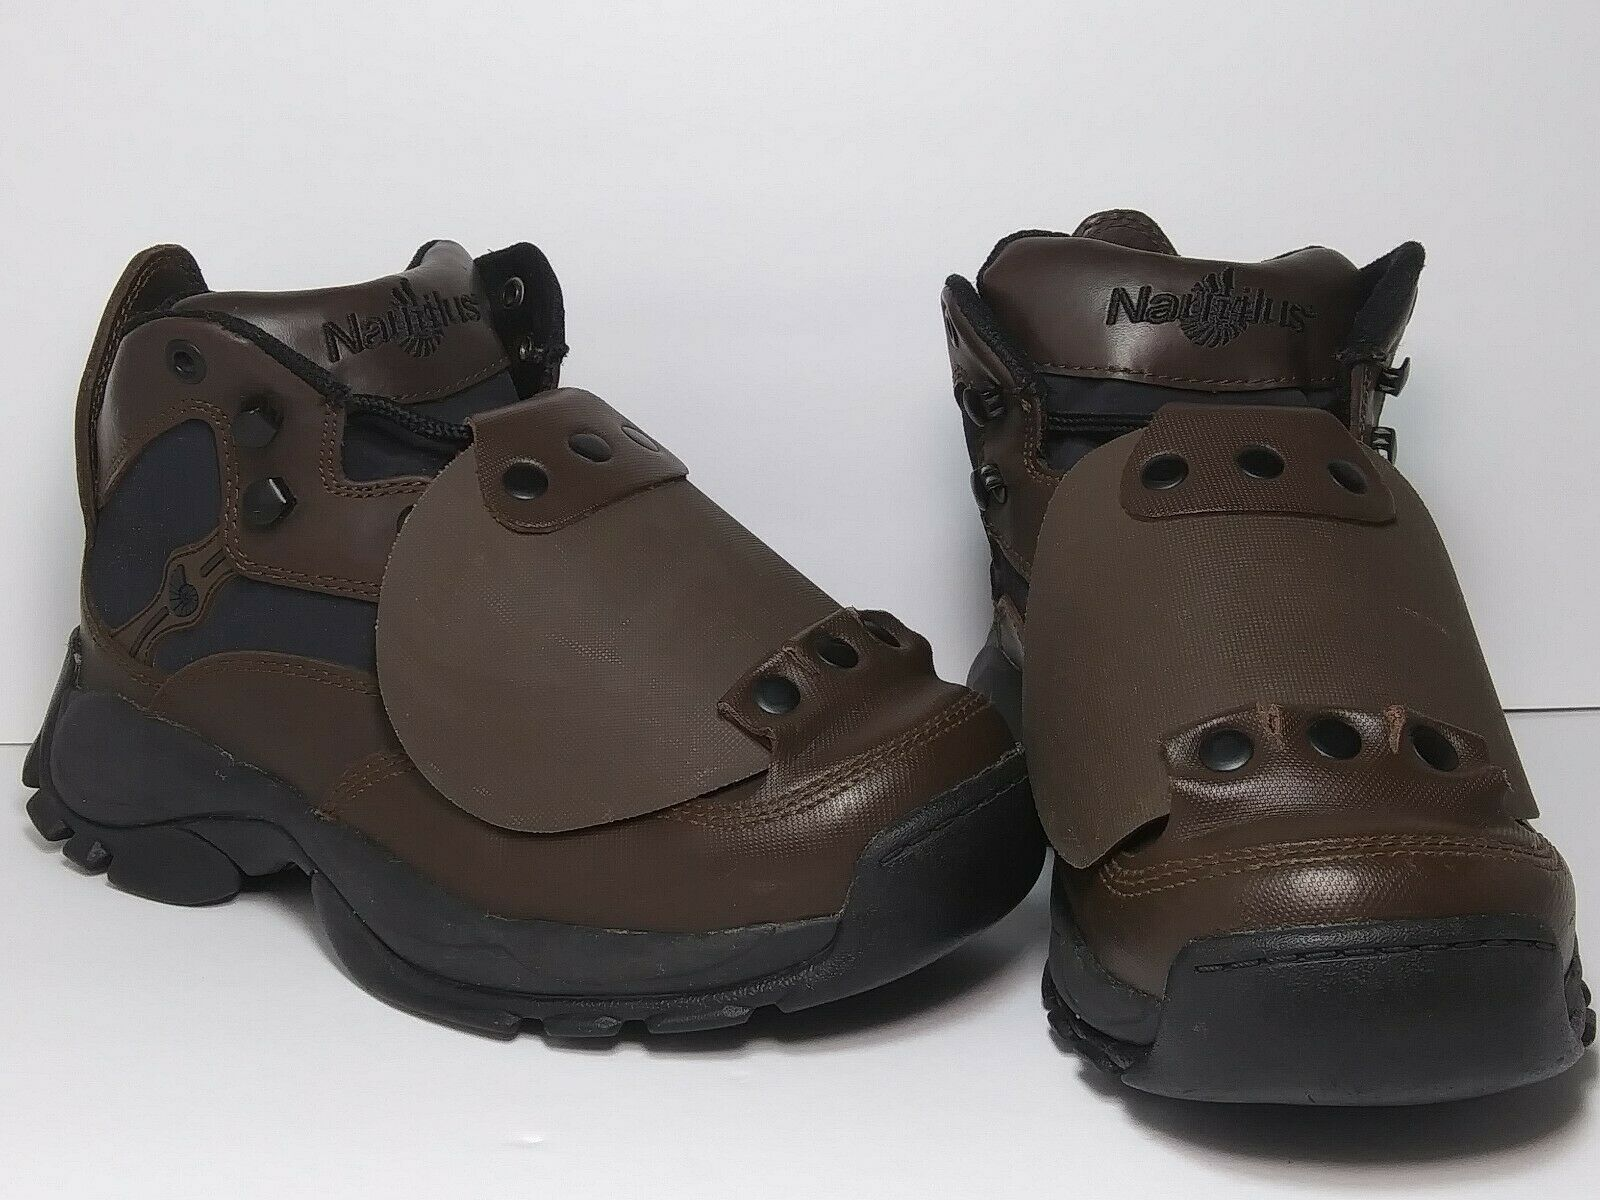 Nautilus ERGOFLEX Umpire shoes Wide Mid Top Base Ball Mens US Size 8 1 2 M